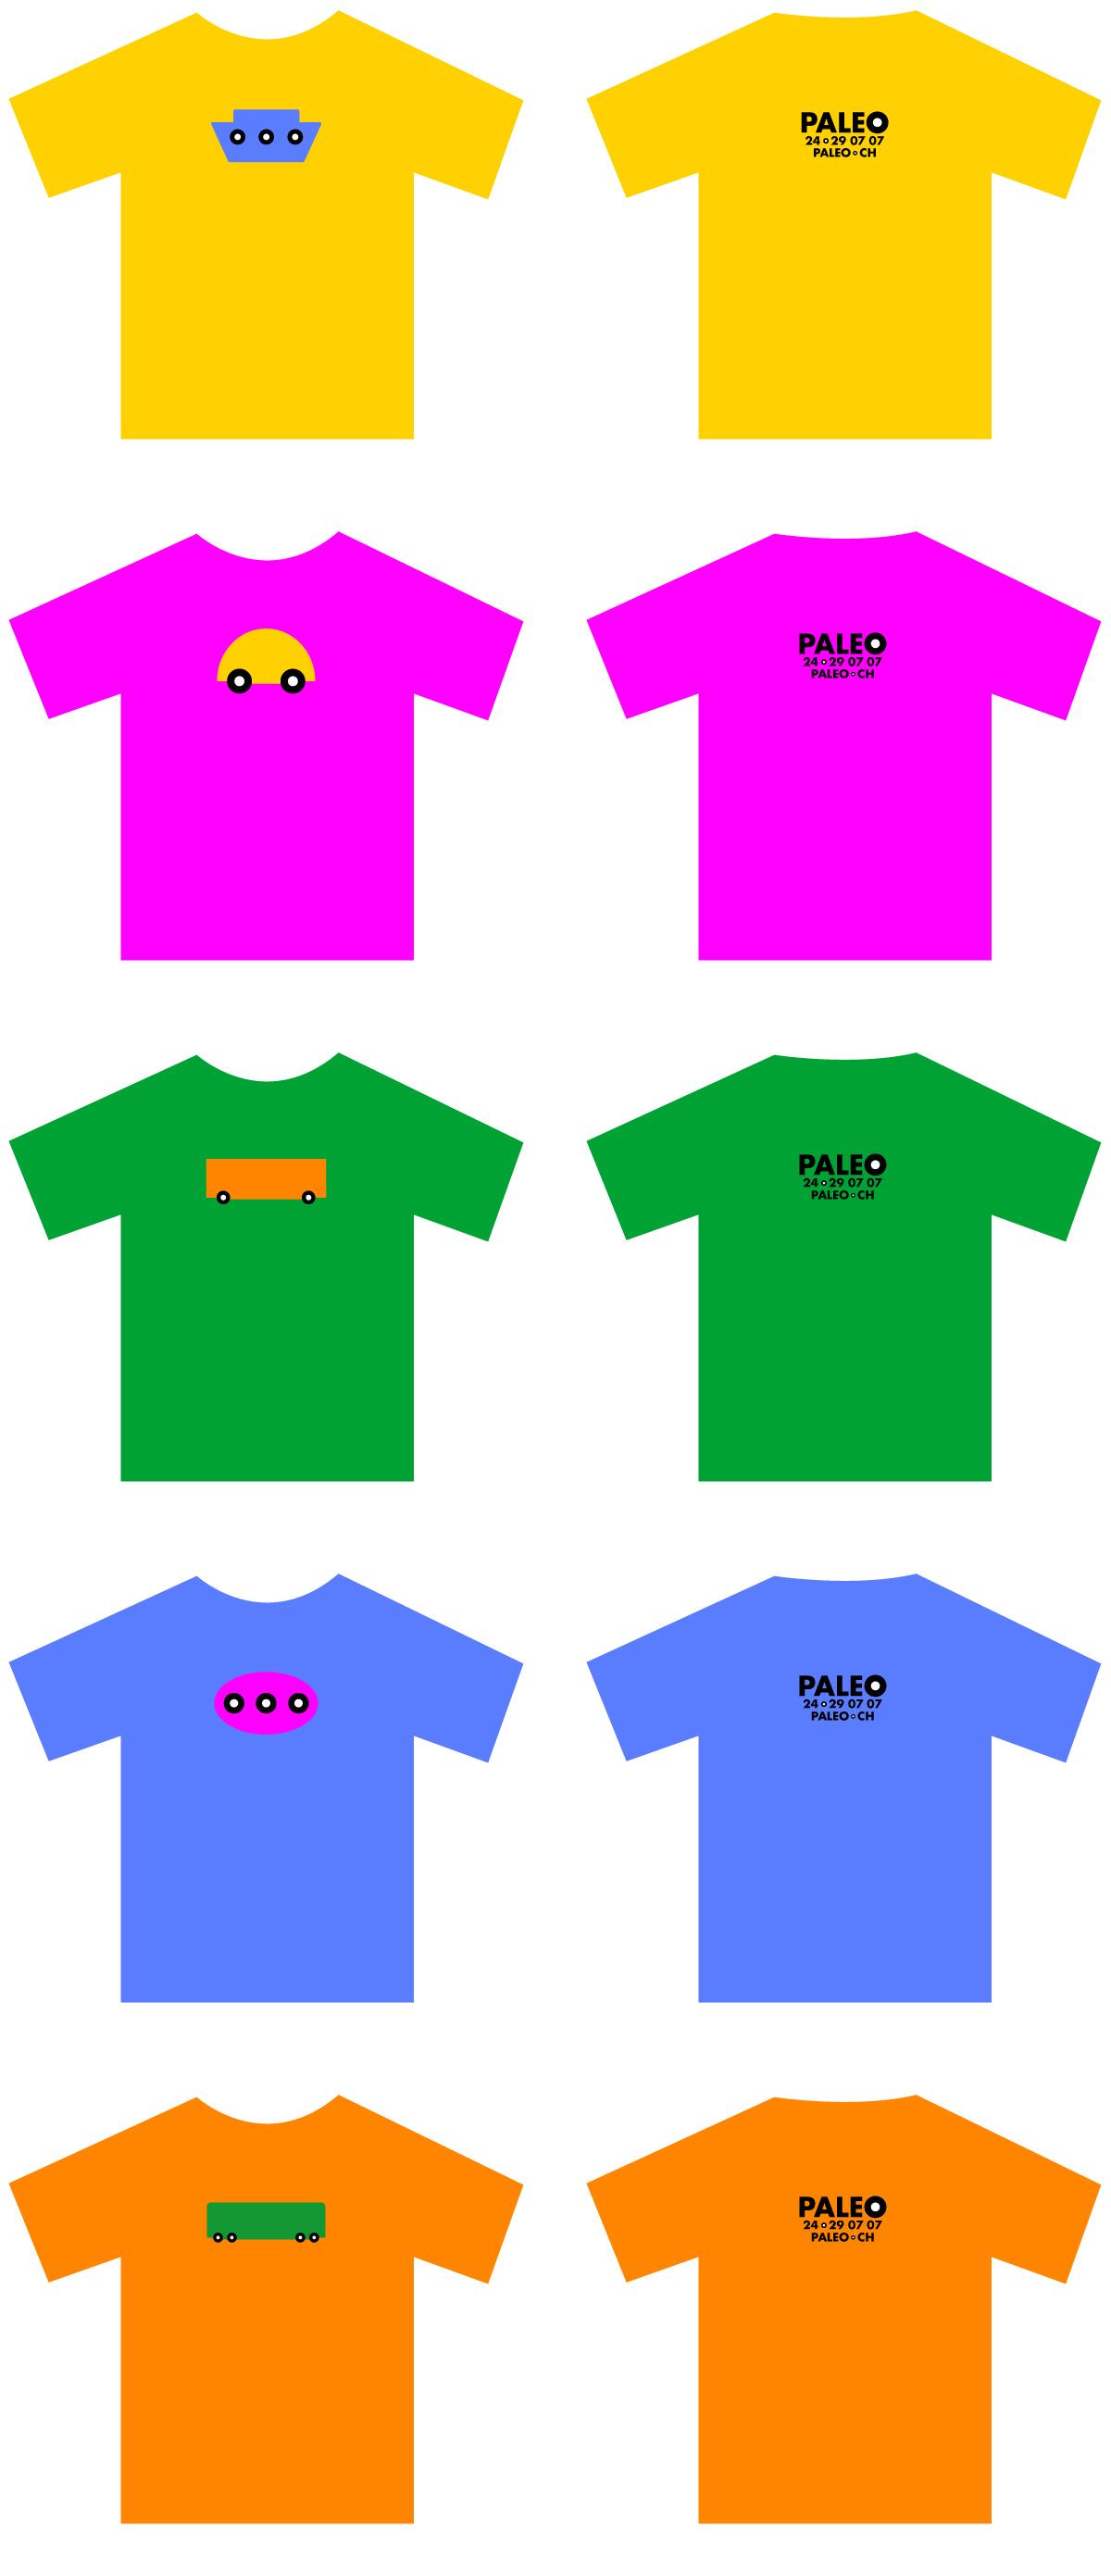 T-shirts Paleo Festival de Nyon - 2007